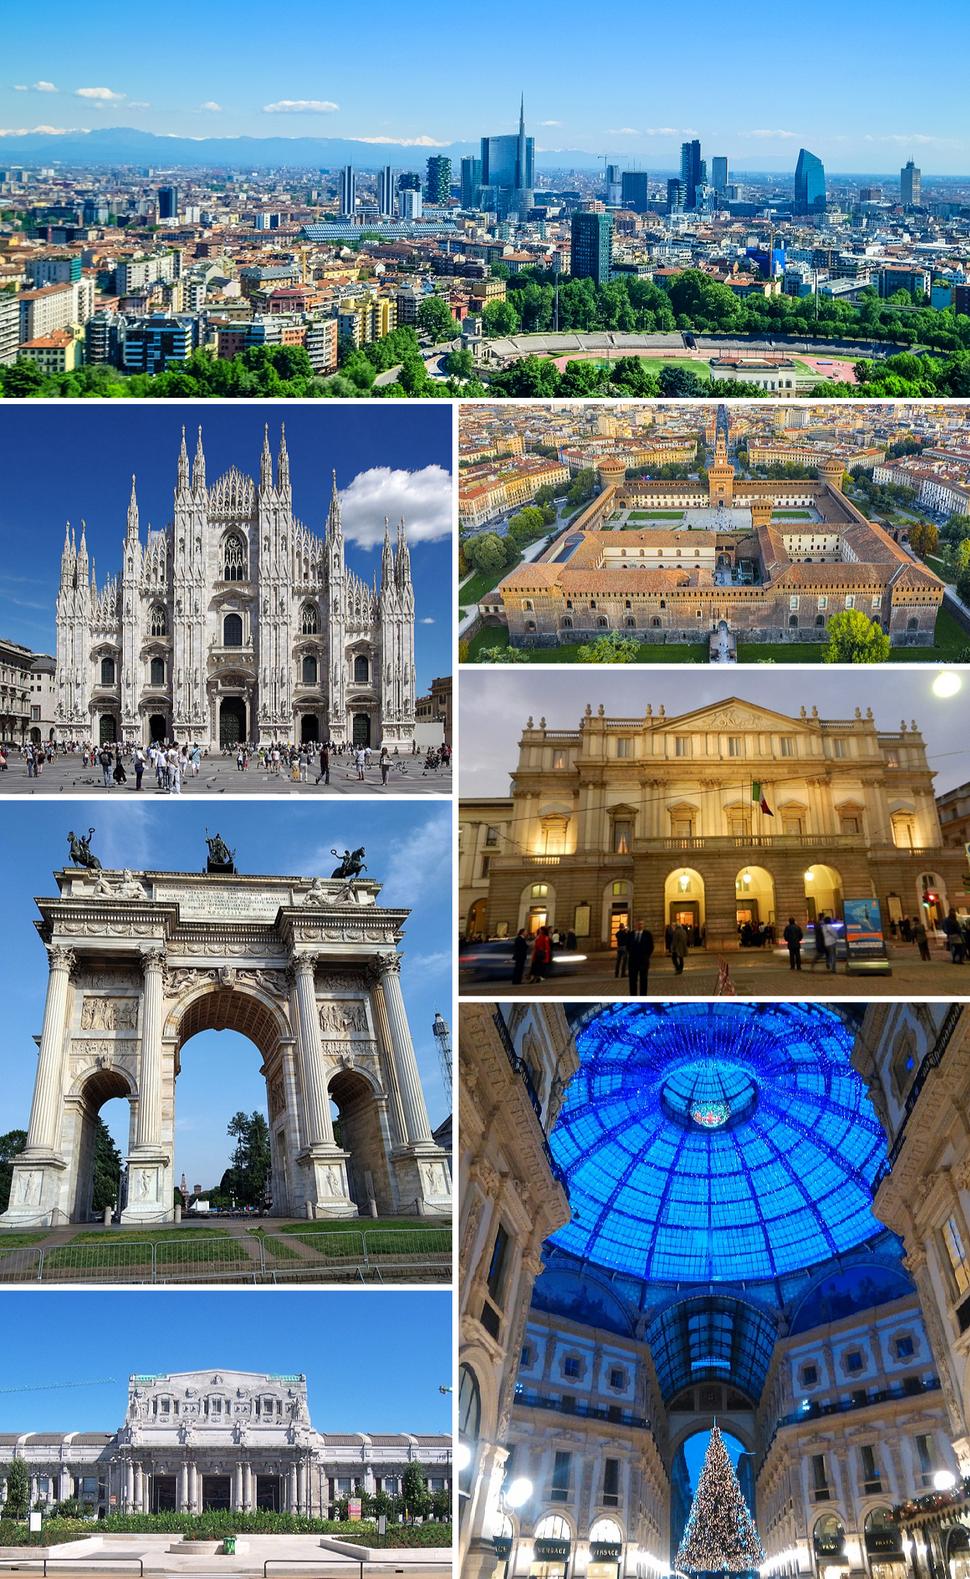 Clockwise from top: Porta Nuova, Sforza Castle, La Scala, Galleria Vittorio Emanuele II, Milano Centrale railway station, Arch of Peace and Milan Cathedral.